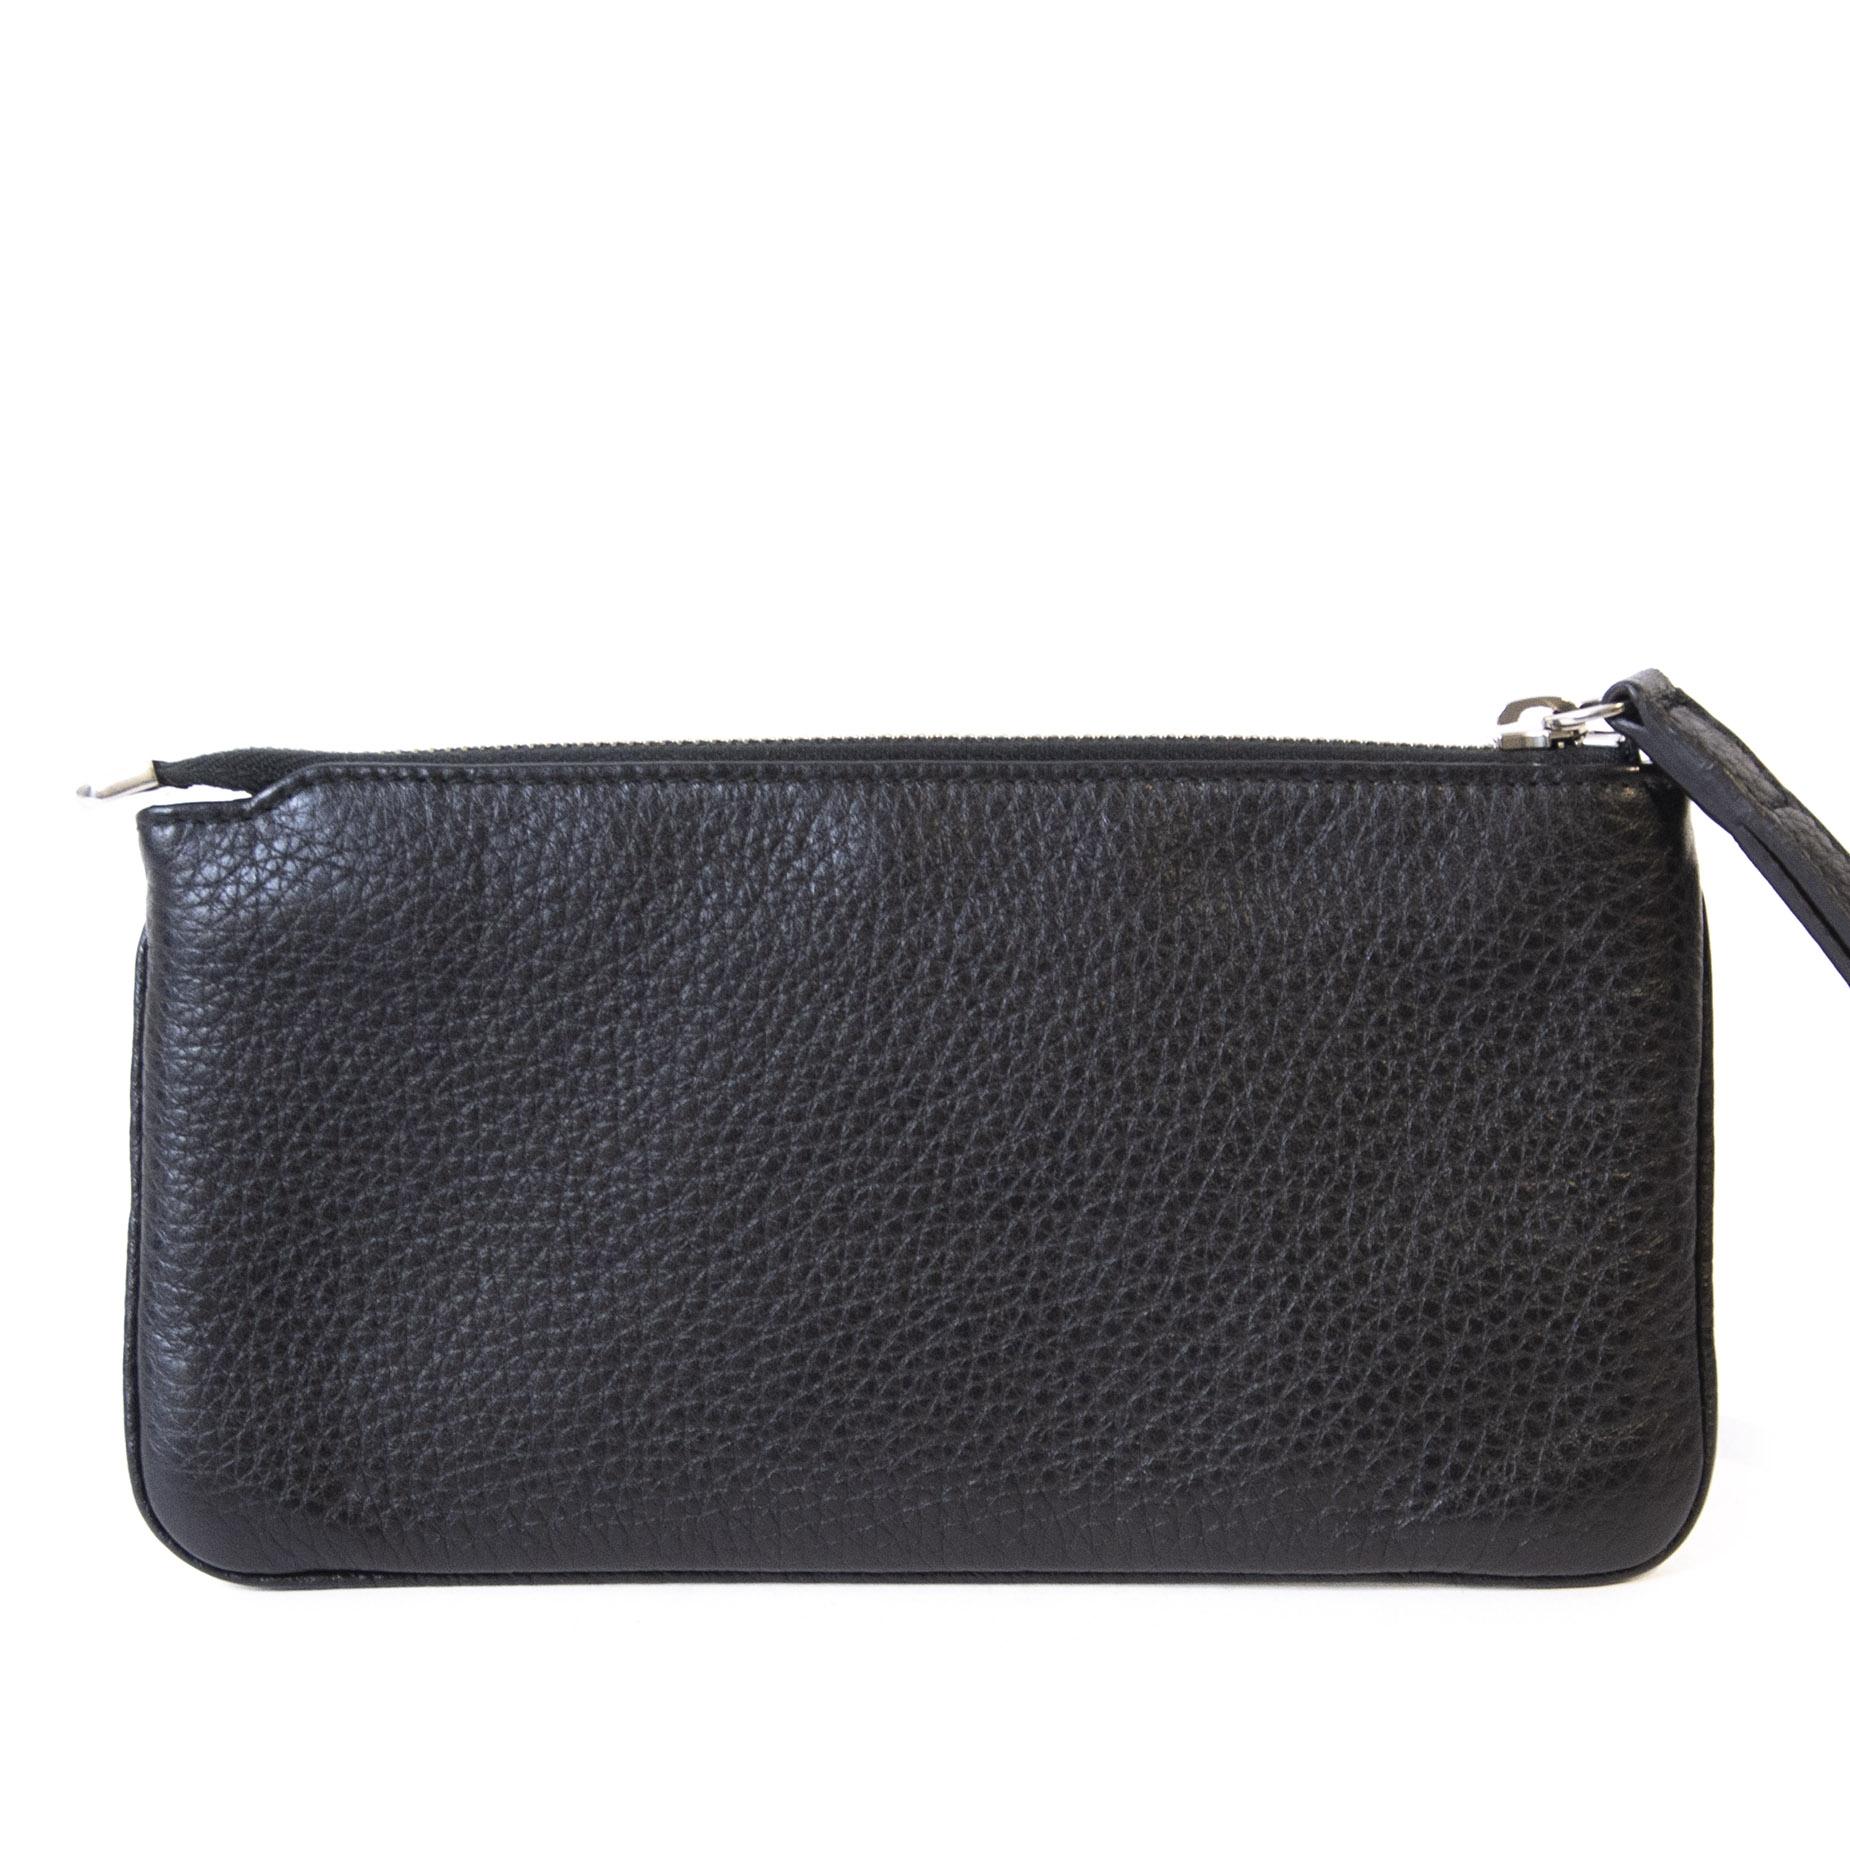 Authentieke Tweedehands Gucci Black Leather Pochette Bag GG Silver Studs juiste prijs veilig online shoppen luxe merken webshop winkelen Antwerpen België mode fashion